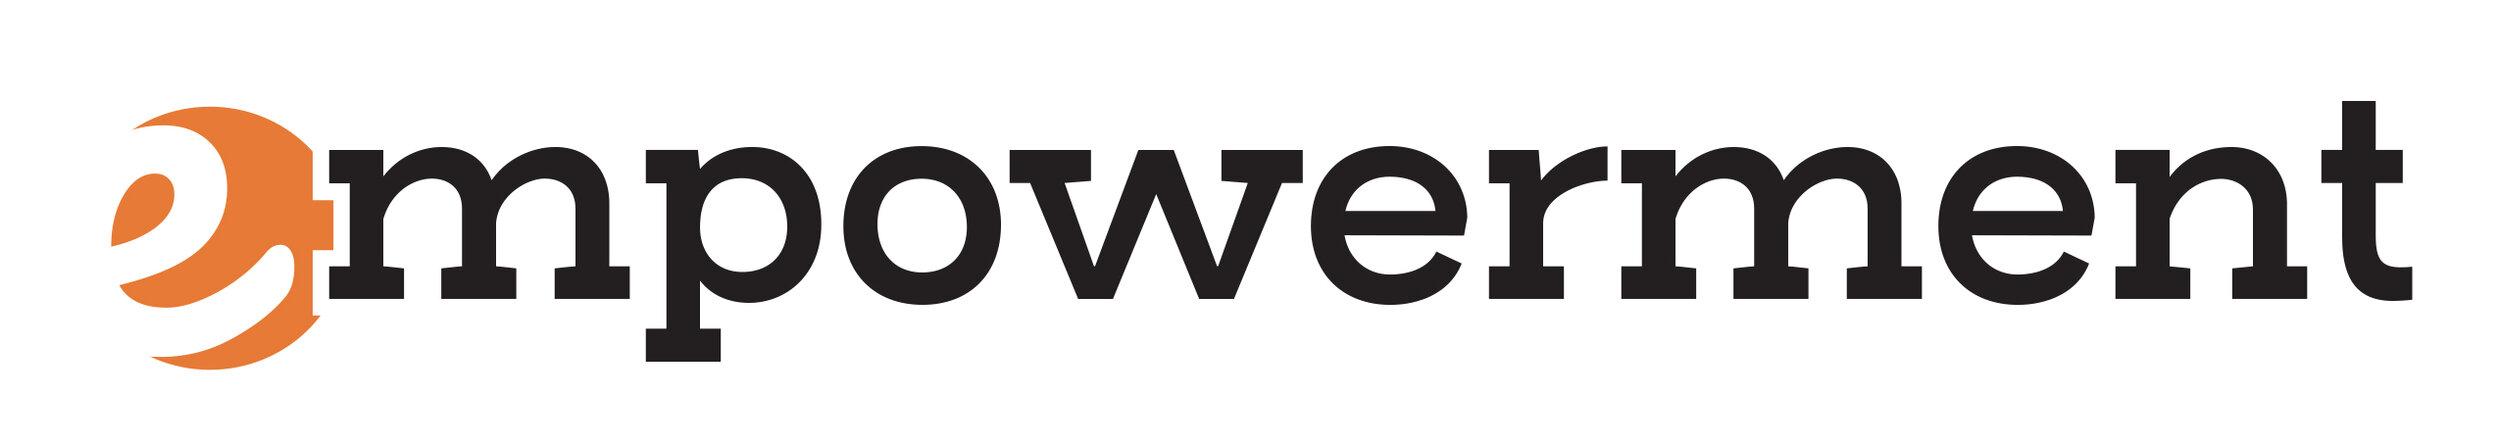 Empowerment Logo.jpg